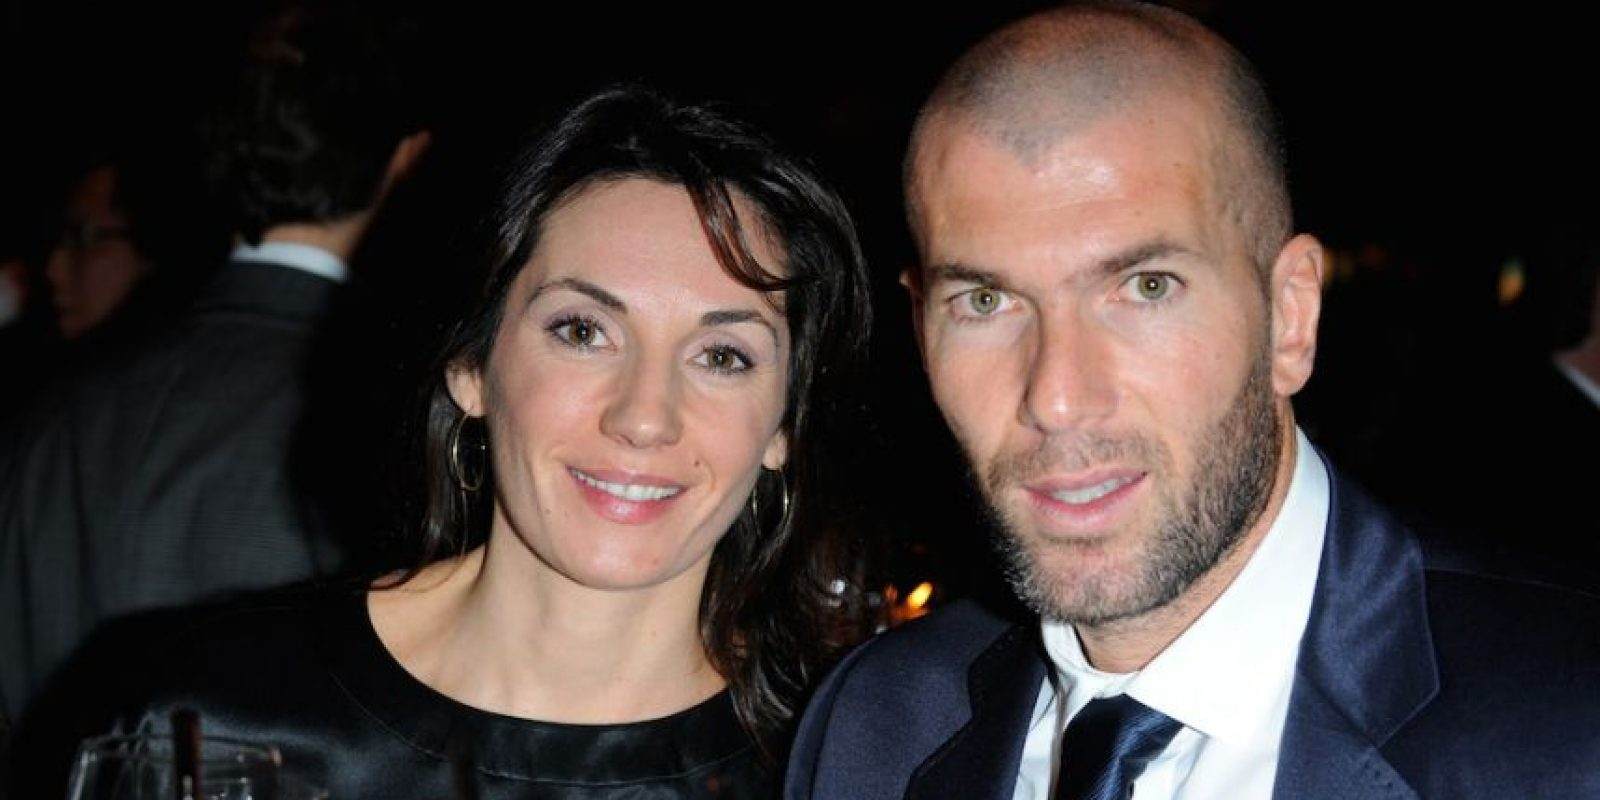 Véronique Fernández y Zinedine Zidane. Foto:Getty Images